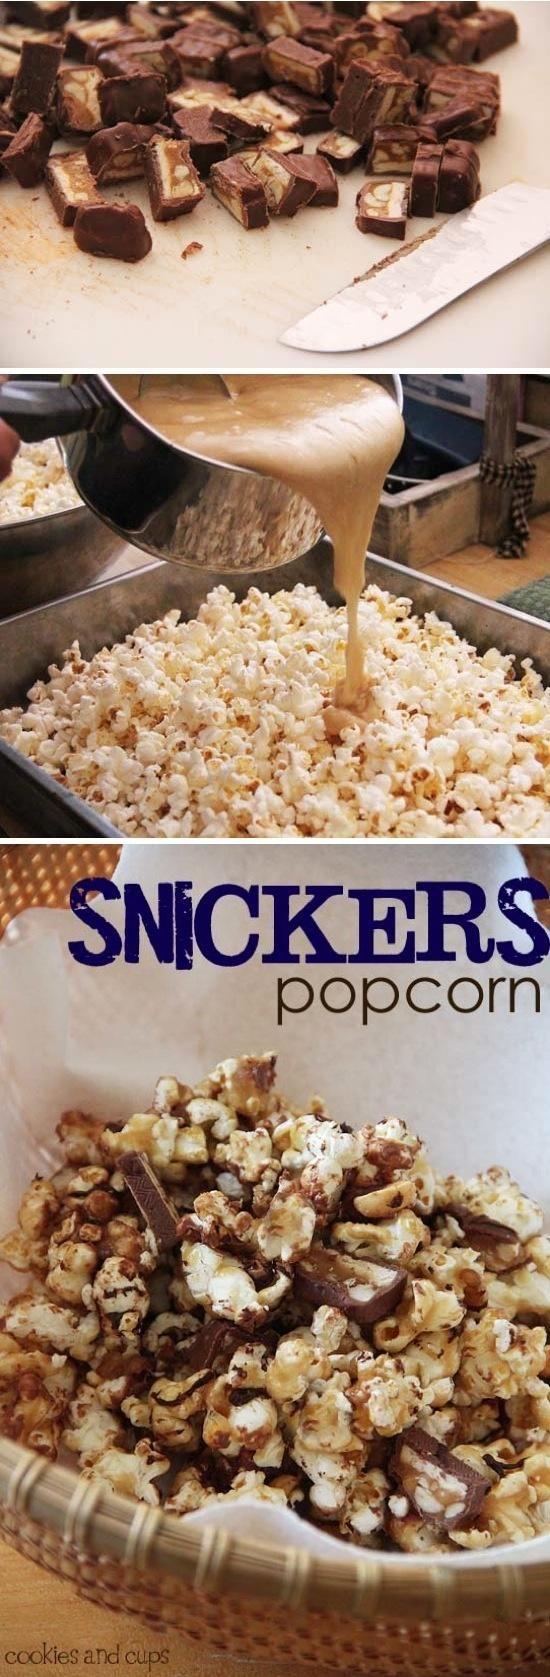 Snickers Popcorn!